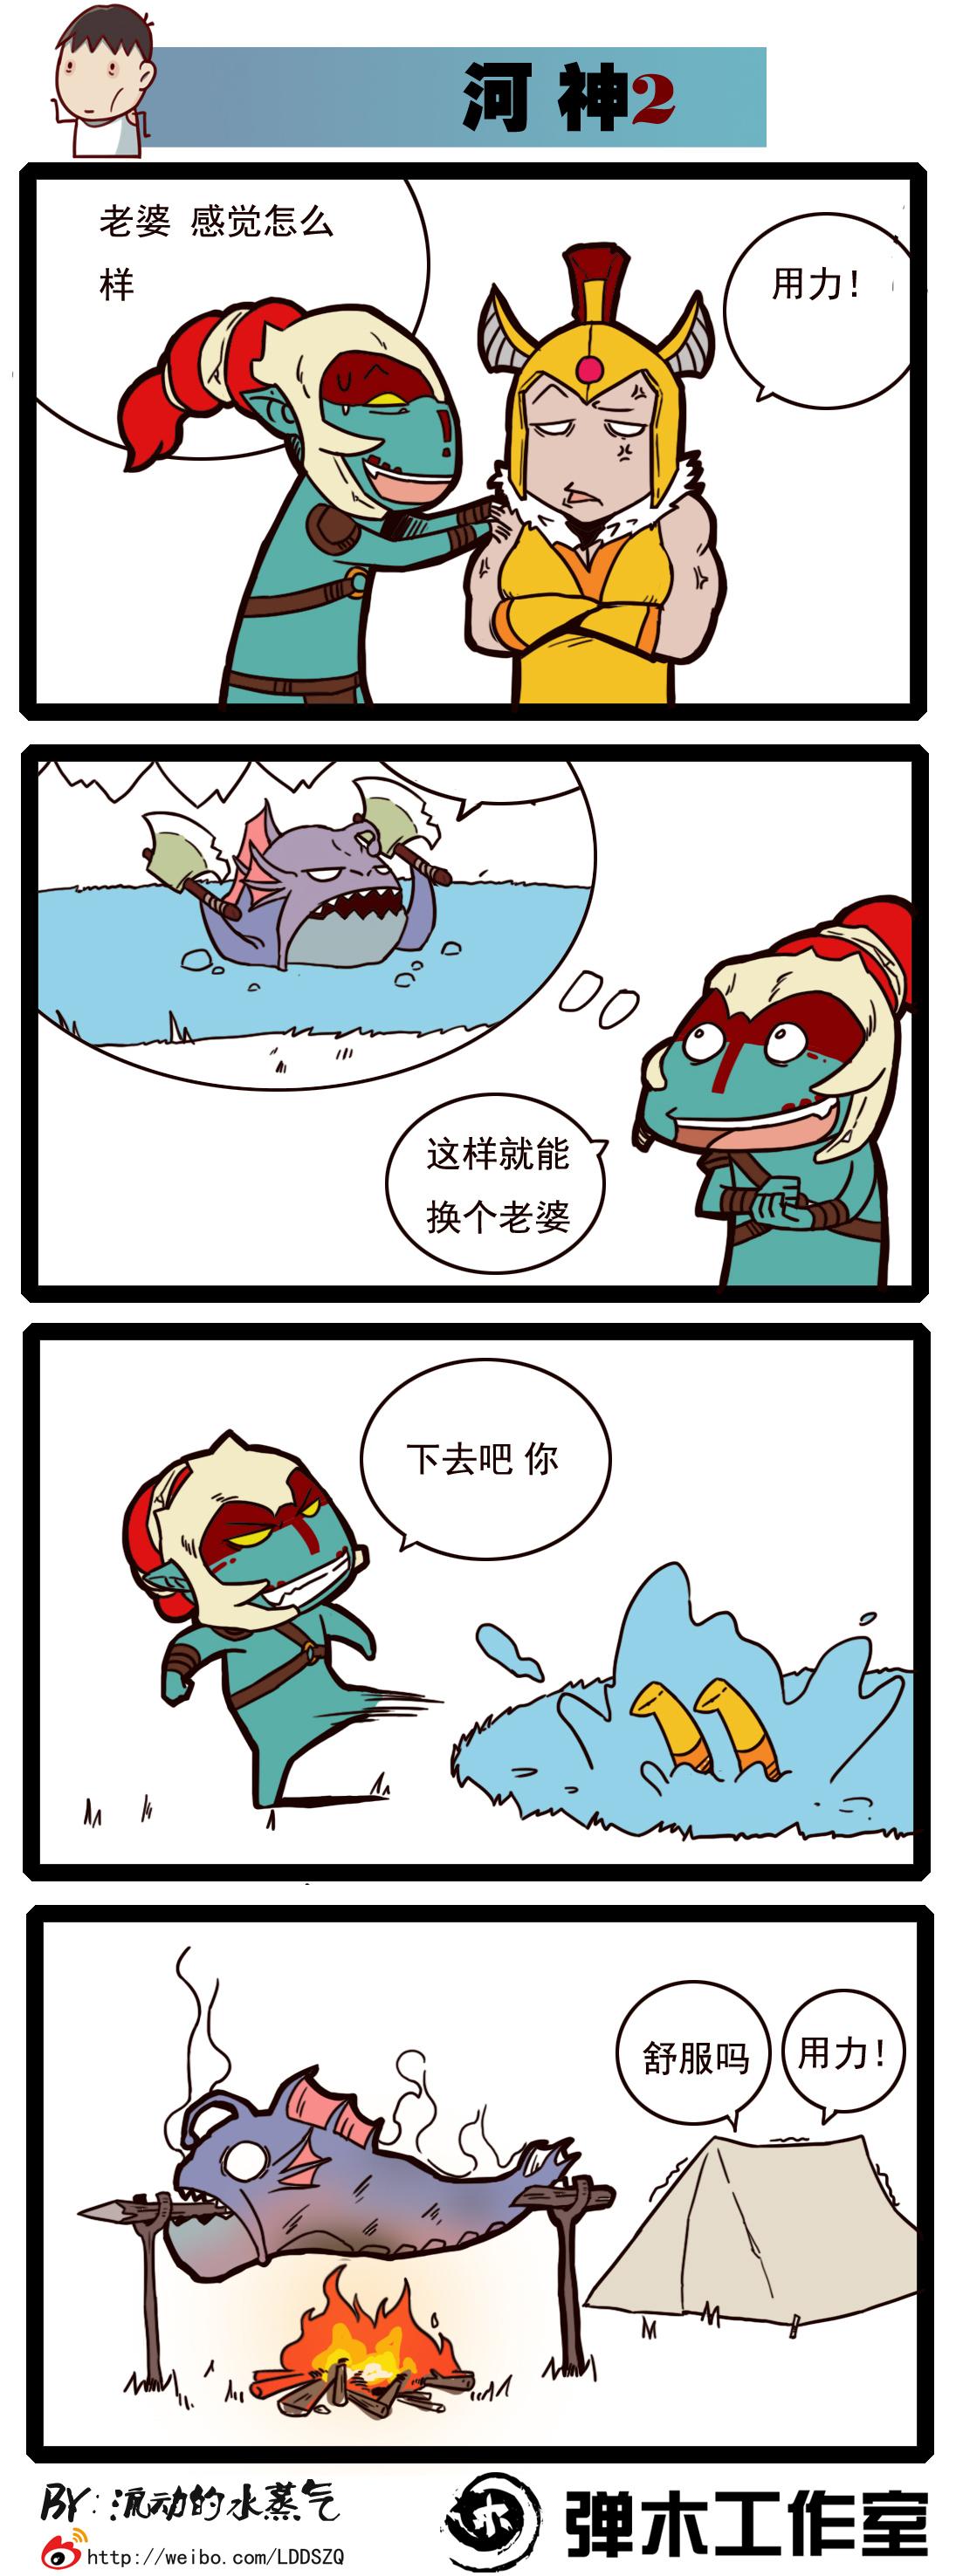 dota2搞笑漫画_探秘英雄的幸福生活 dota2爆笑四格漫画